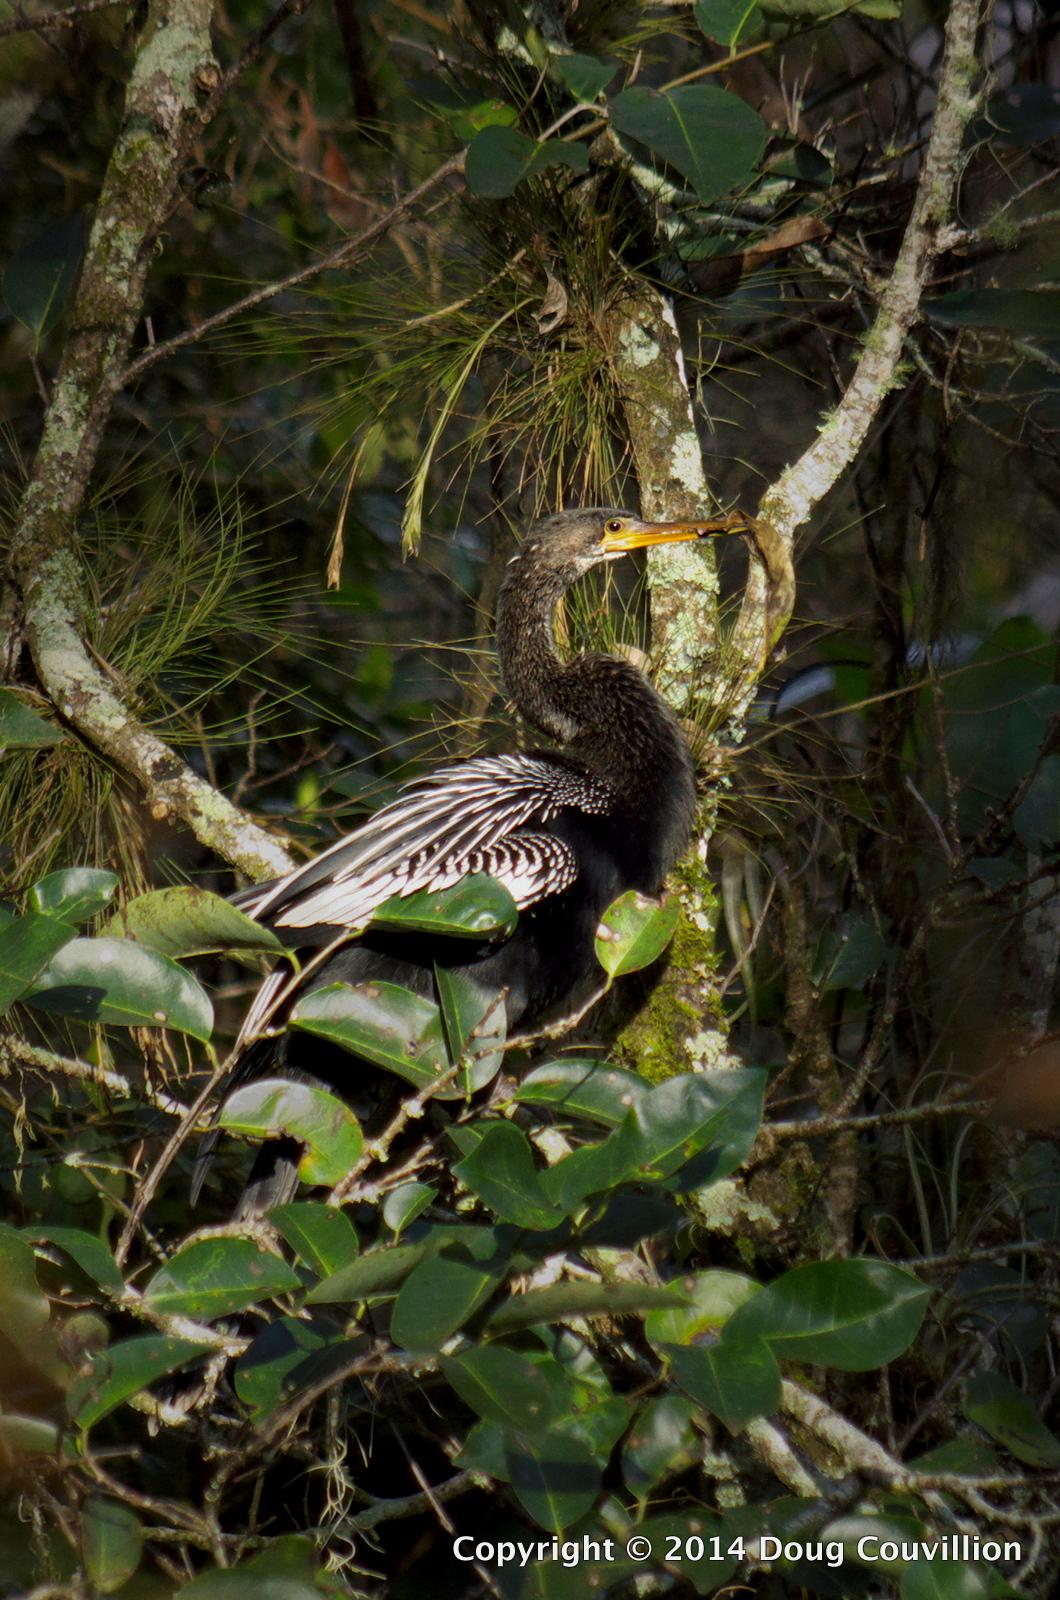 photograph of an Anhinga in a mangrove tree